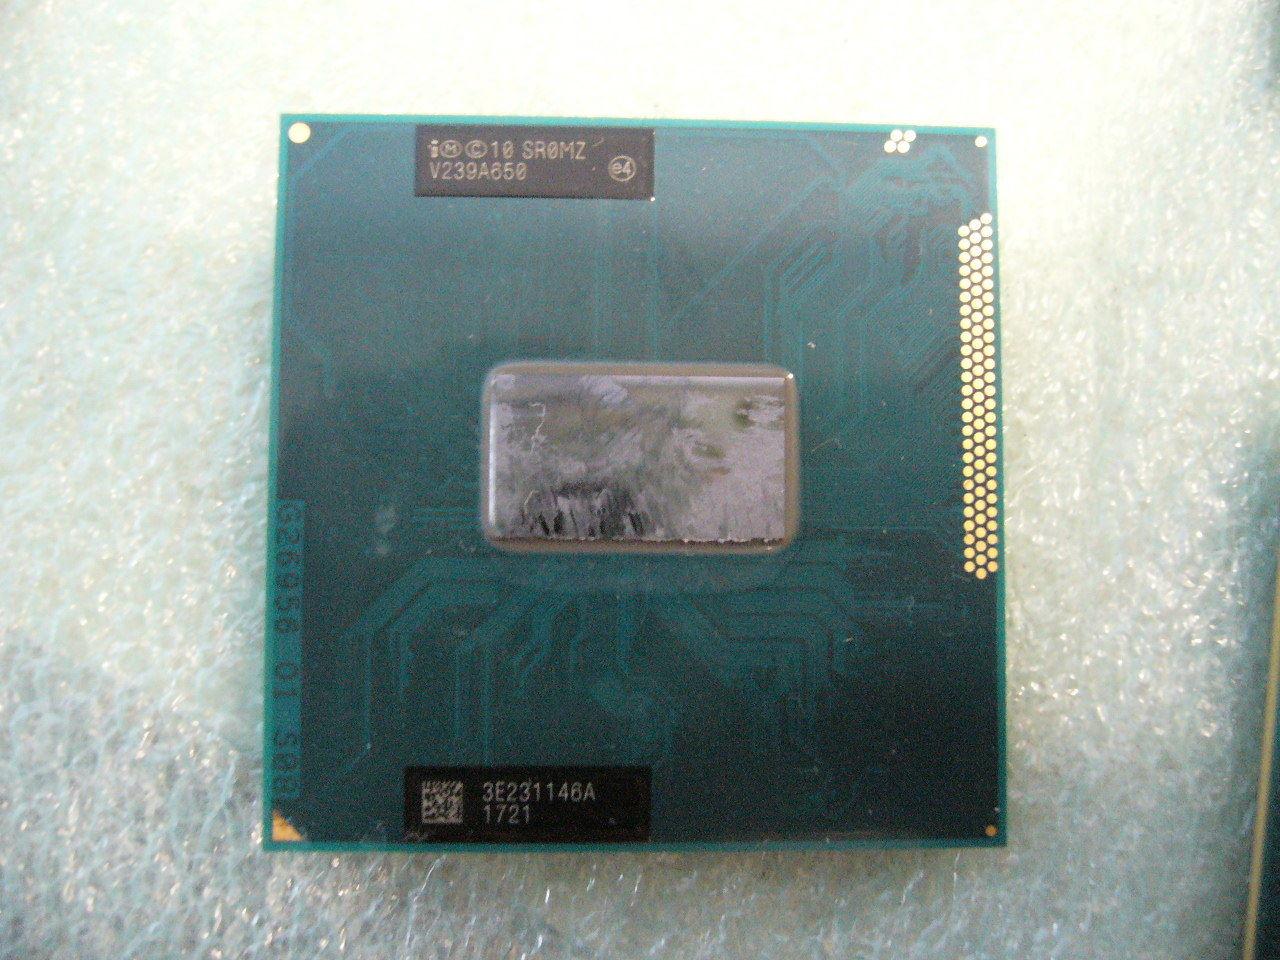 QTY 1x INTEL Quad-Cores CPU E5540 2.53GHZ//8MB 5.86GT//s QPI LGA1366 SLBF6